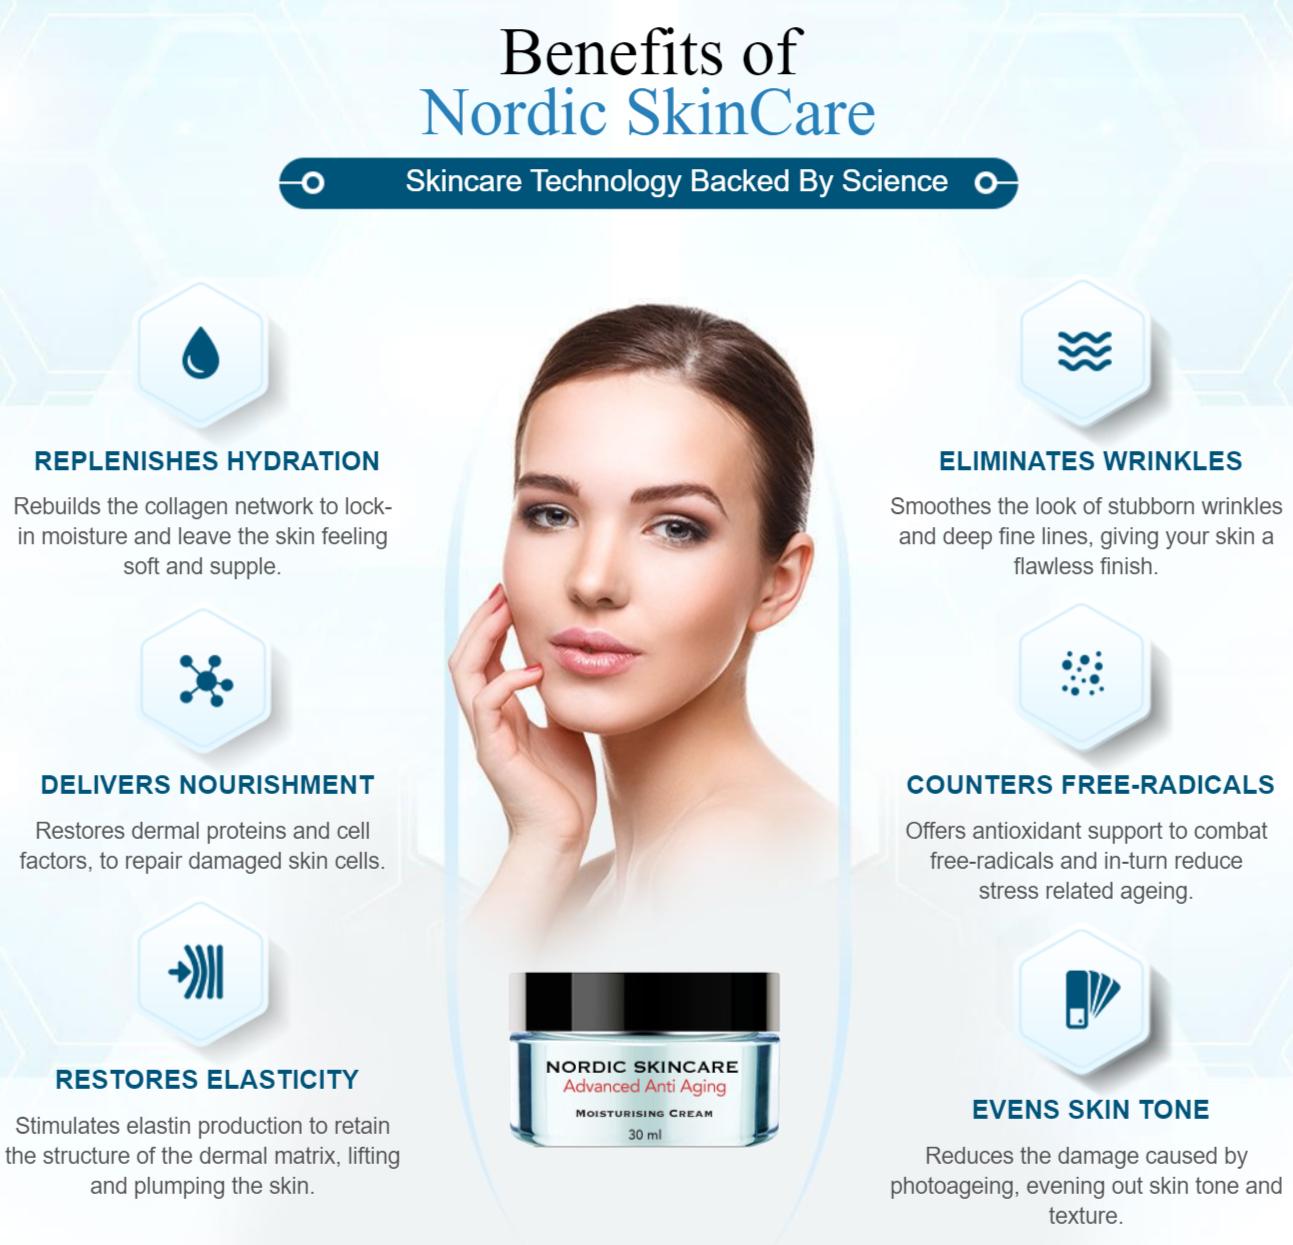 benefits of nordic skincare